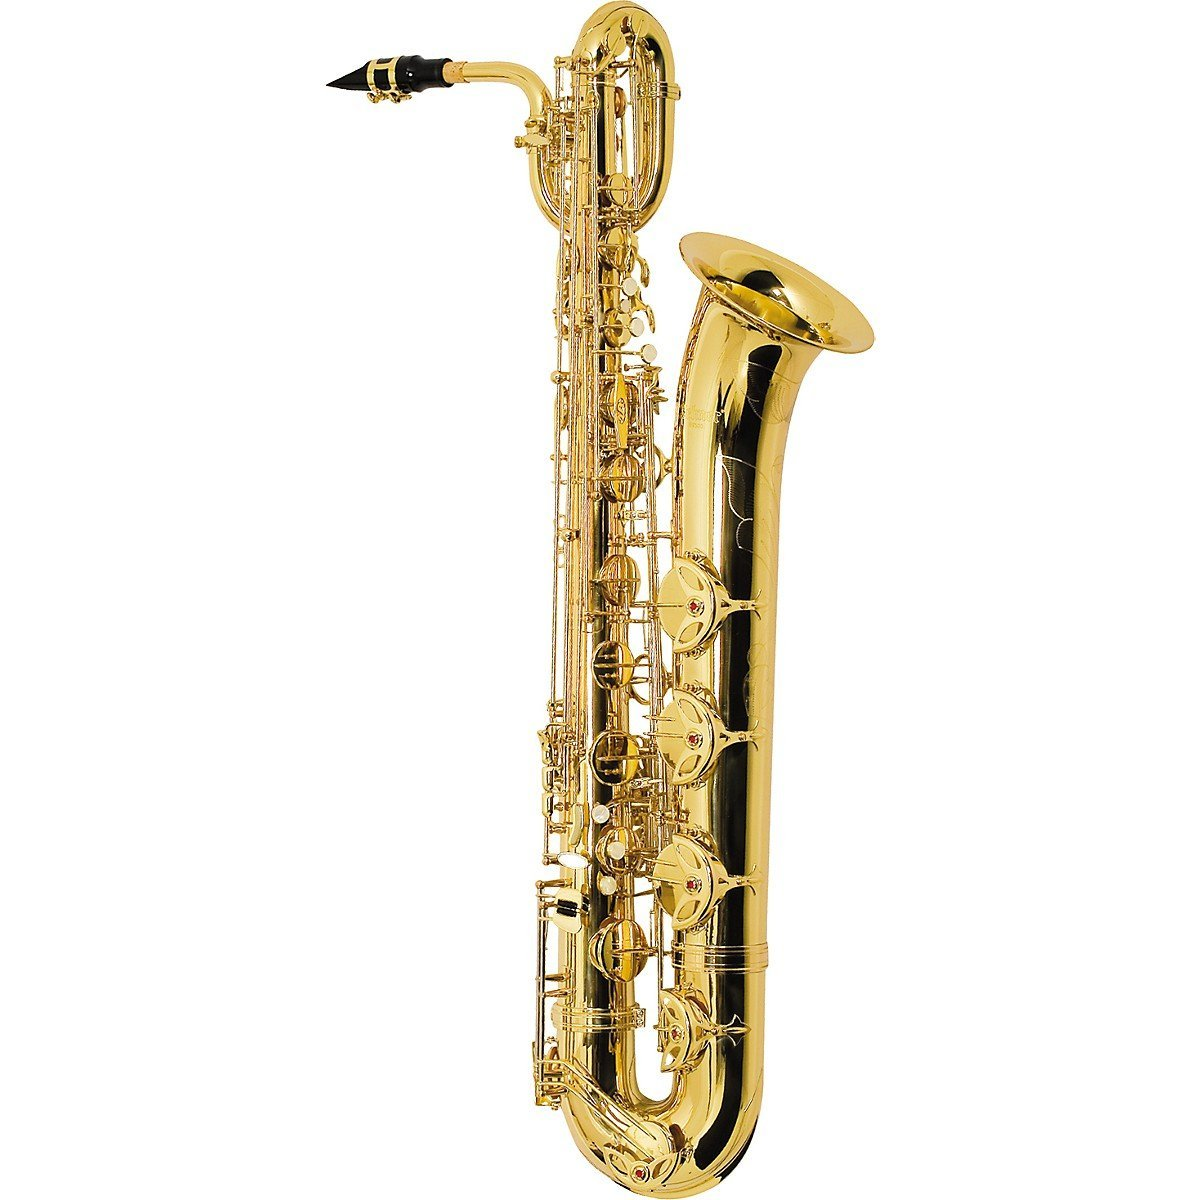 BS500 Baritone Saxophone